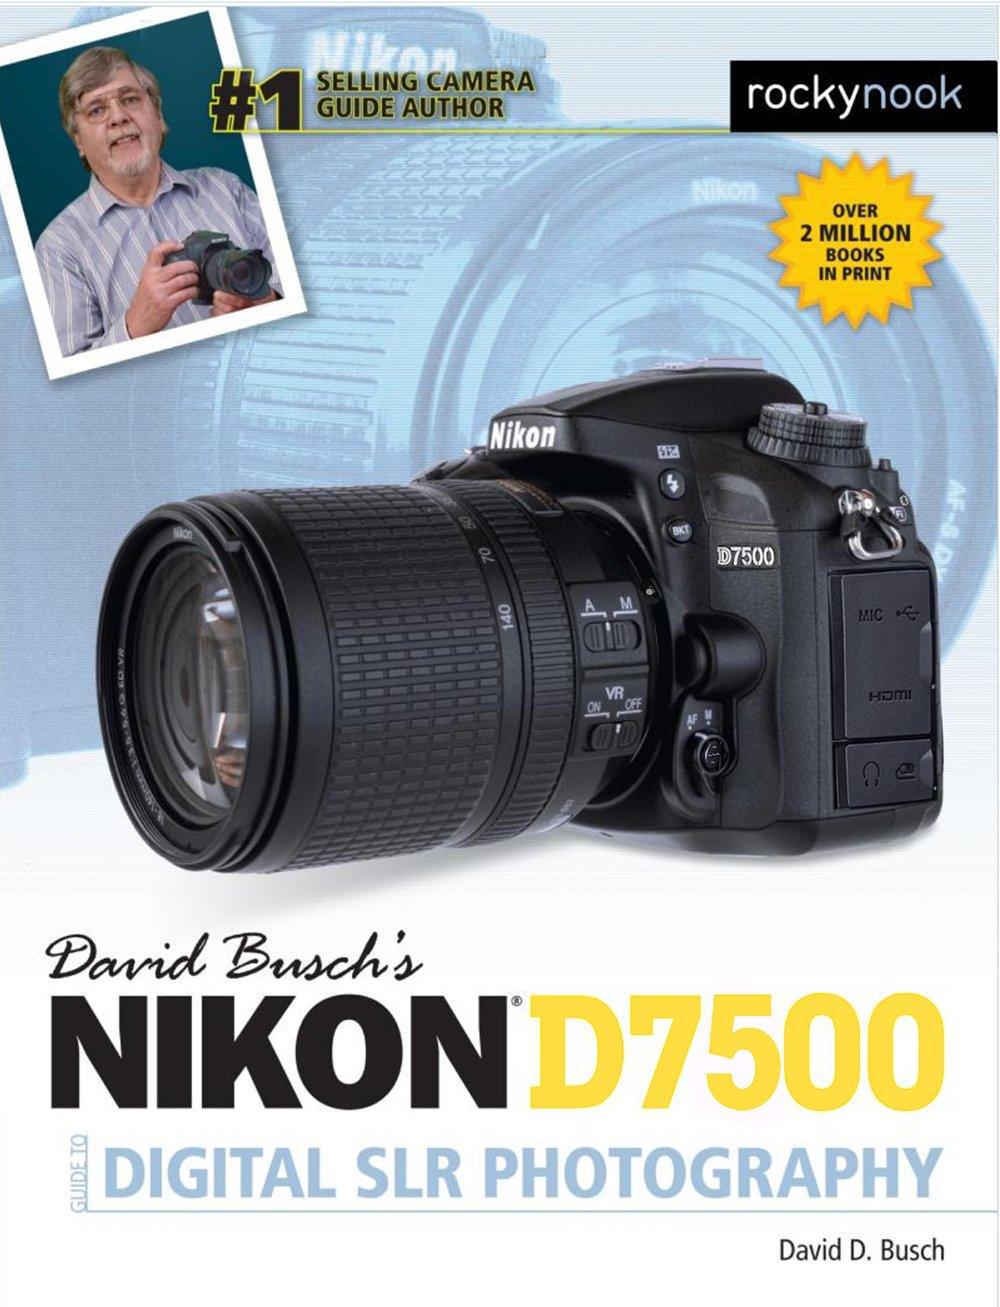 David Buschs Nikon Digital Photography product image